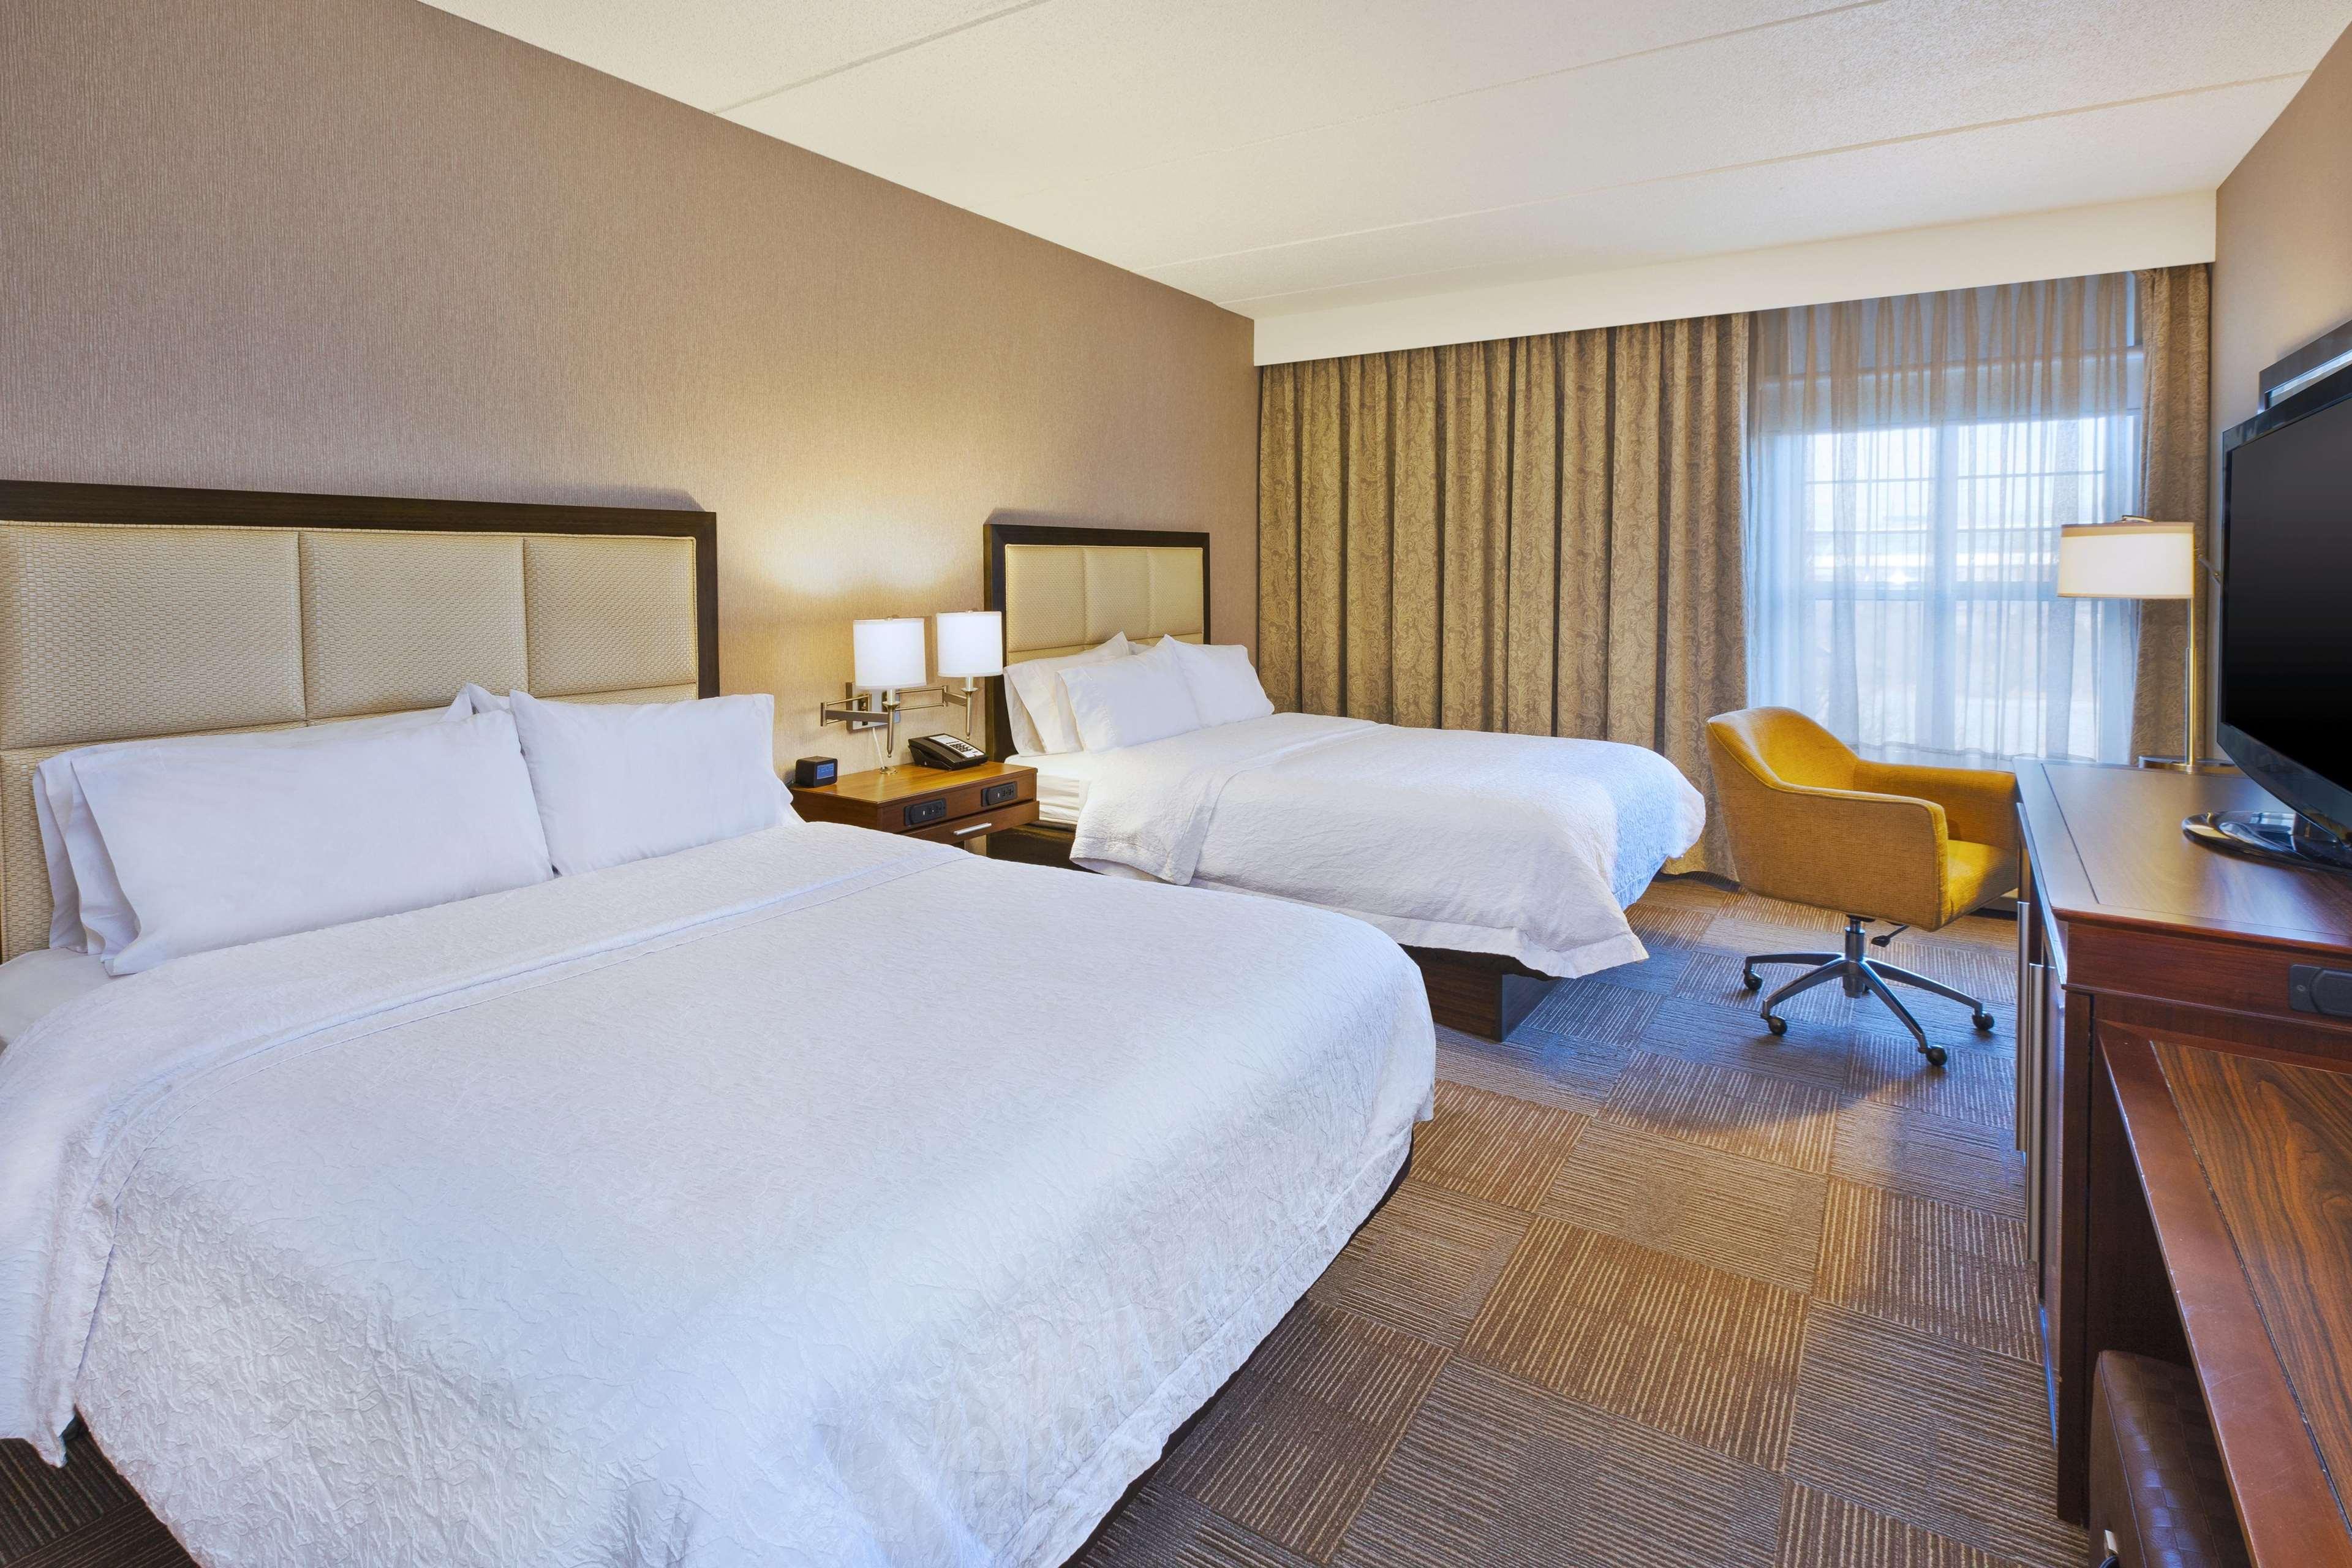 Hampton Inn & Suites Providence/Warwick-Airport image 47